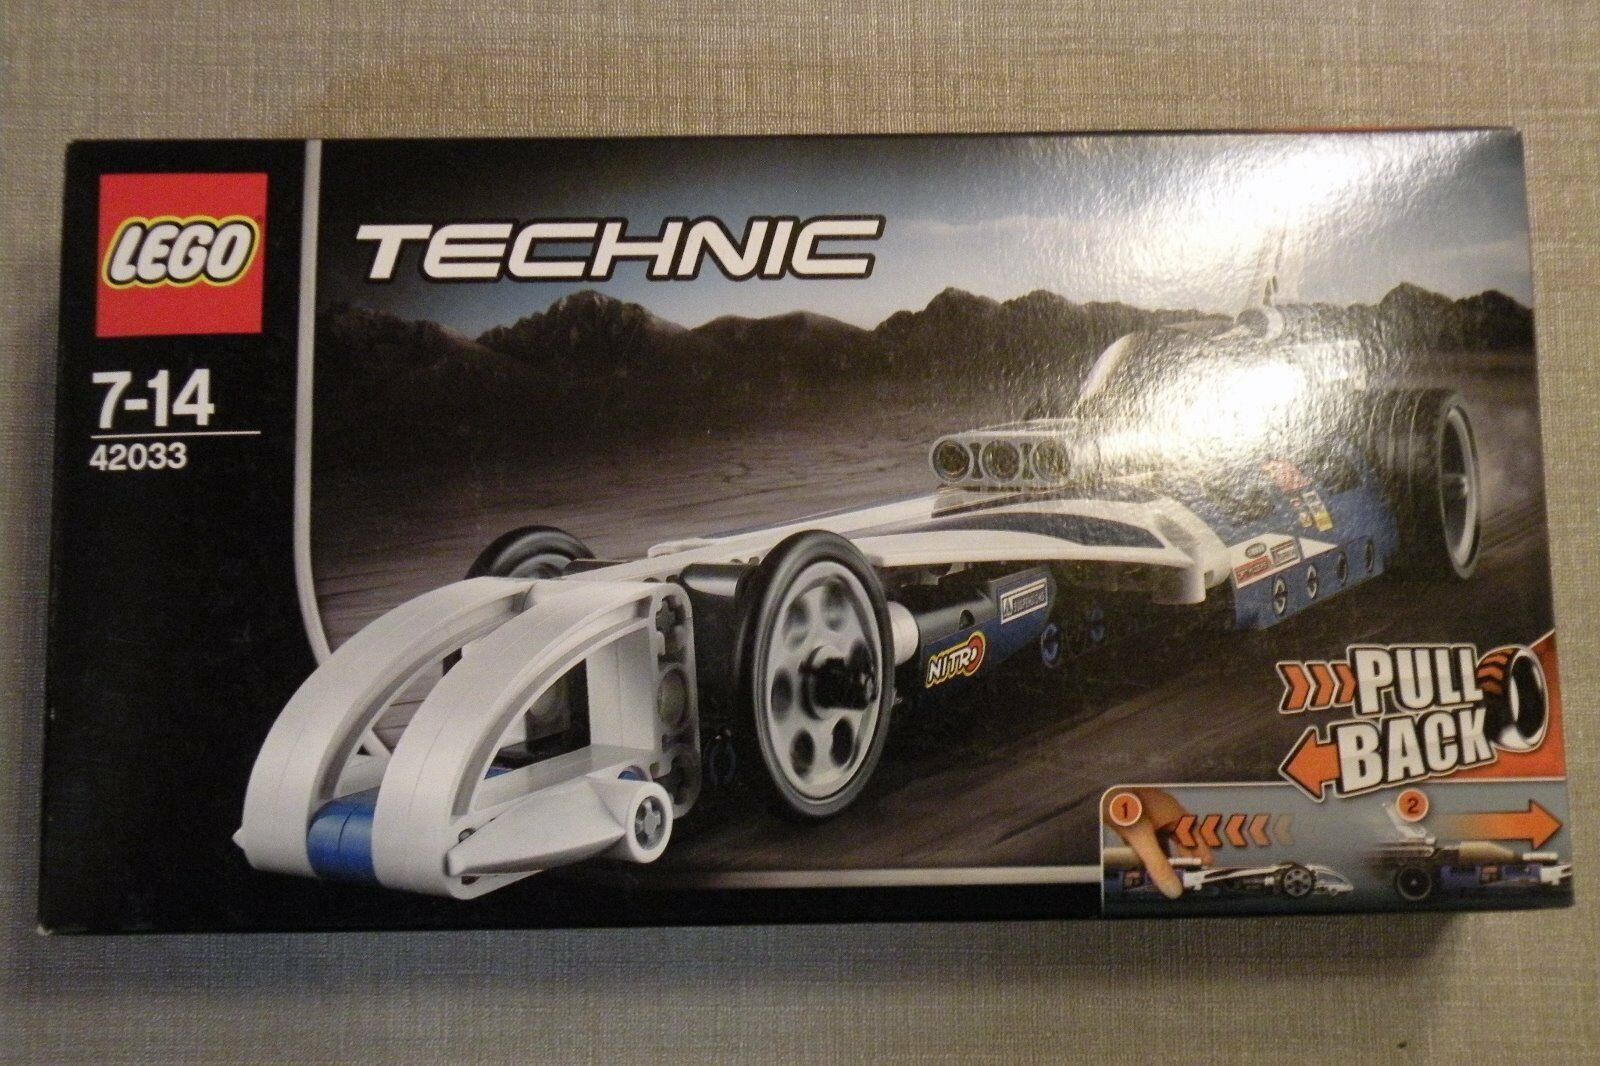 LEGO TECHNIC 42033 -Le bolide imbattable-boite neuve et scellée